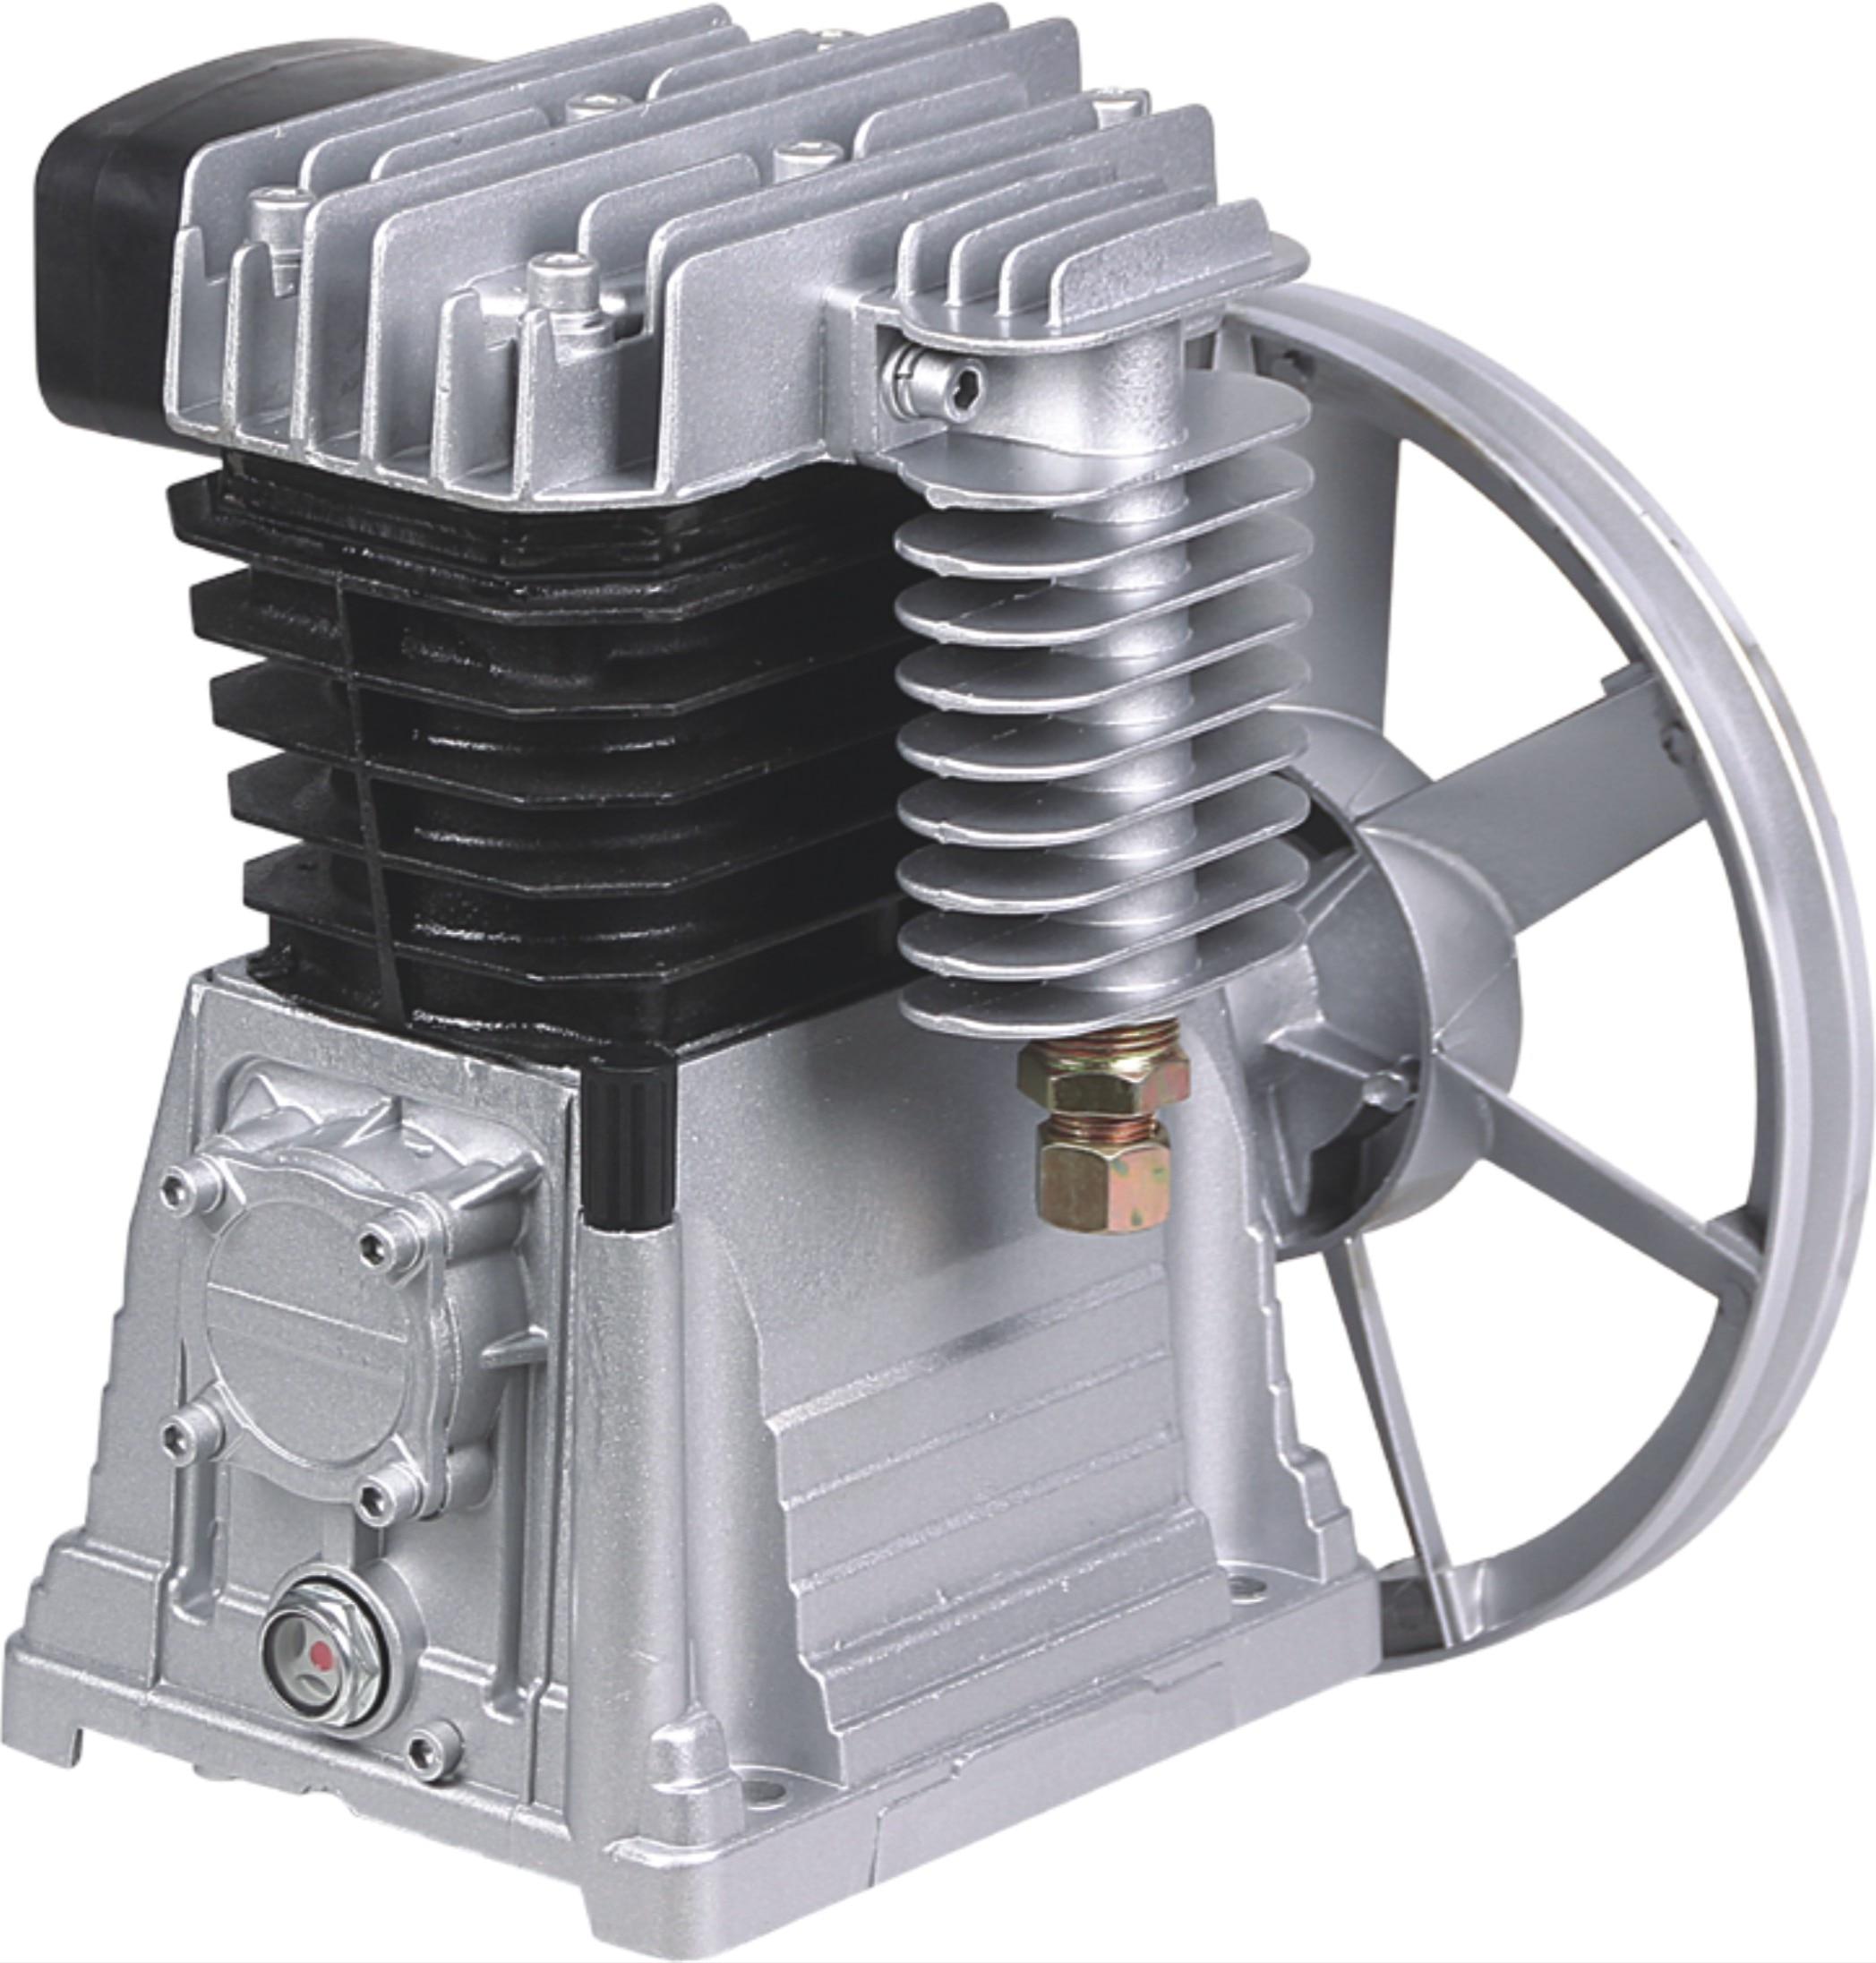 1.5kw/1.8kw/2.2kw ملتصقة اثنين اسطوانة مضخة 115PSI منخفضة الضوضاء تحسين المنزل الطلاء رذاذ الألومنيوم رئيس مضخة هواء الصناعية